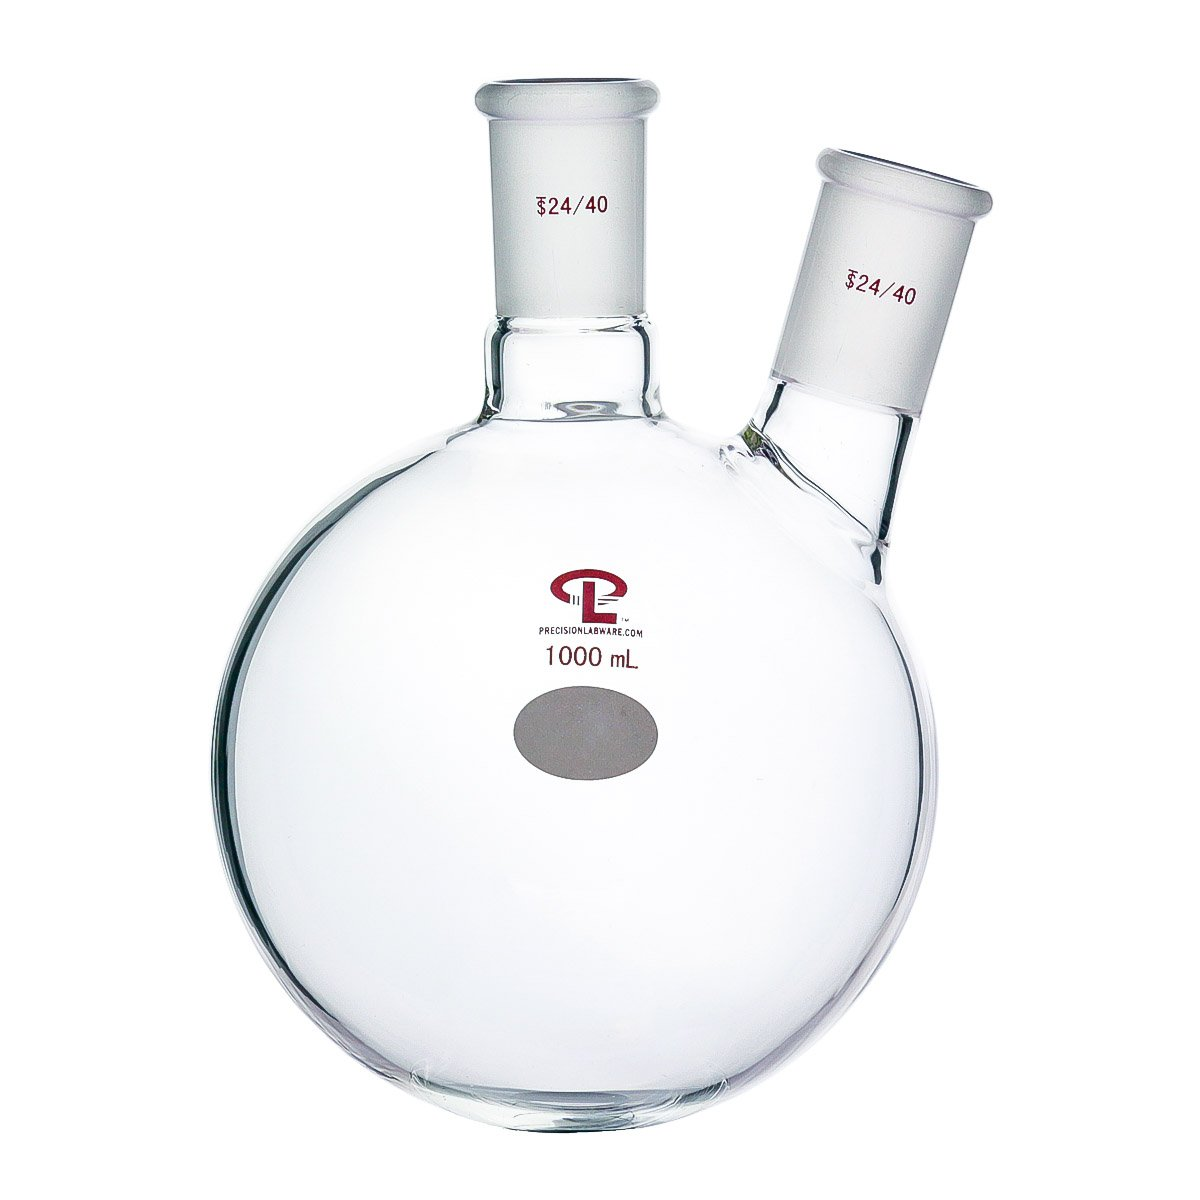 Precision 1000mL 24/40 Two Neck Round Bottom Flask, Heavy Wall, Borosilicate Glass